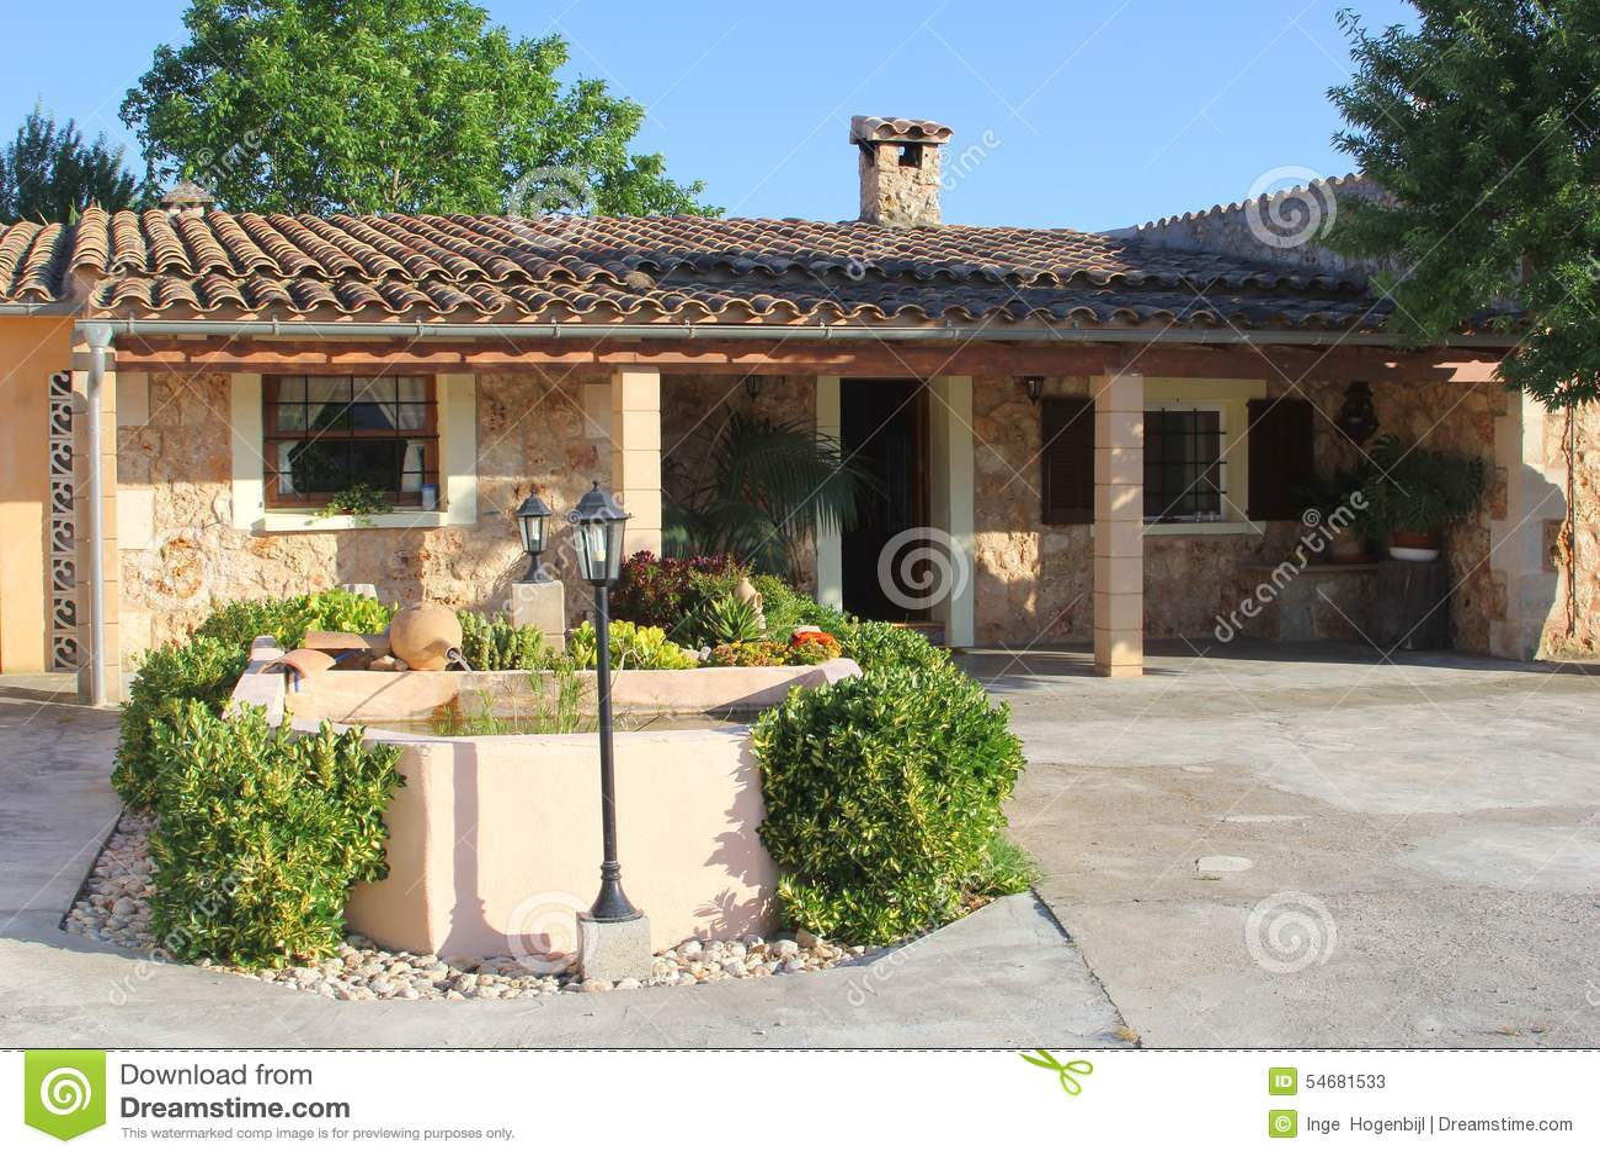 Luxury Mediterranean Home Mallorca Spain Stock Photo